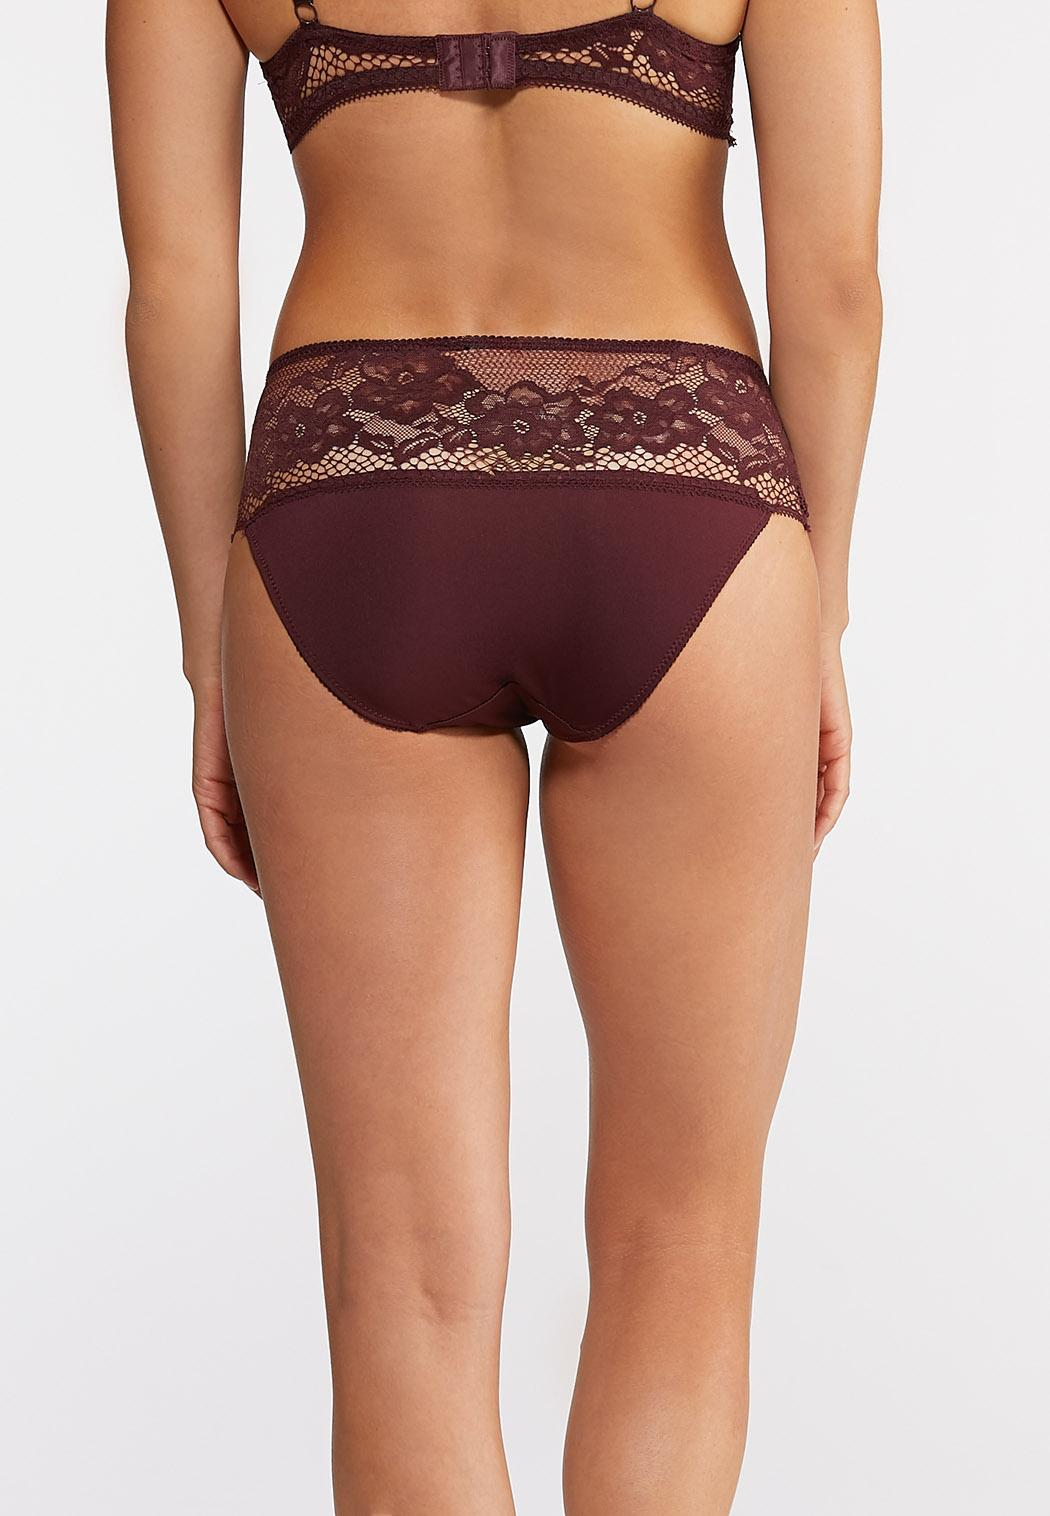 Floral Lace Hipster Panty Set (Item #43946857)